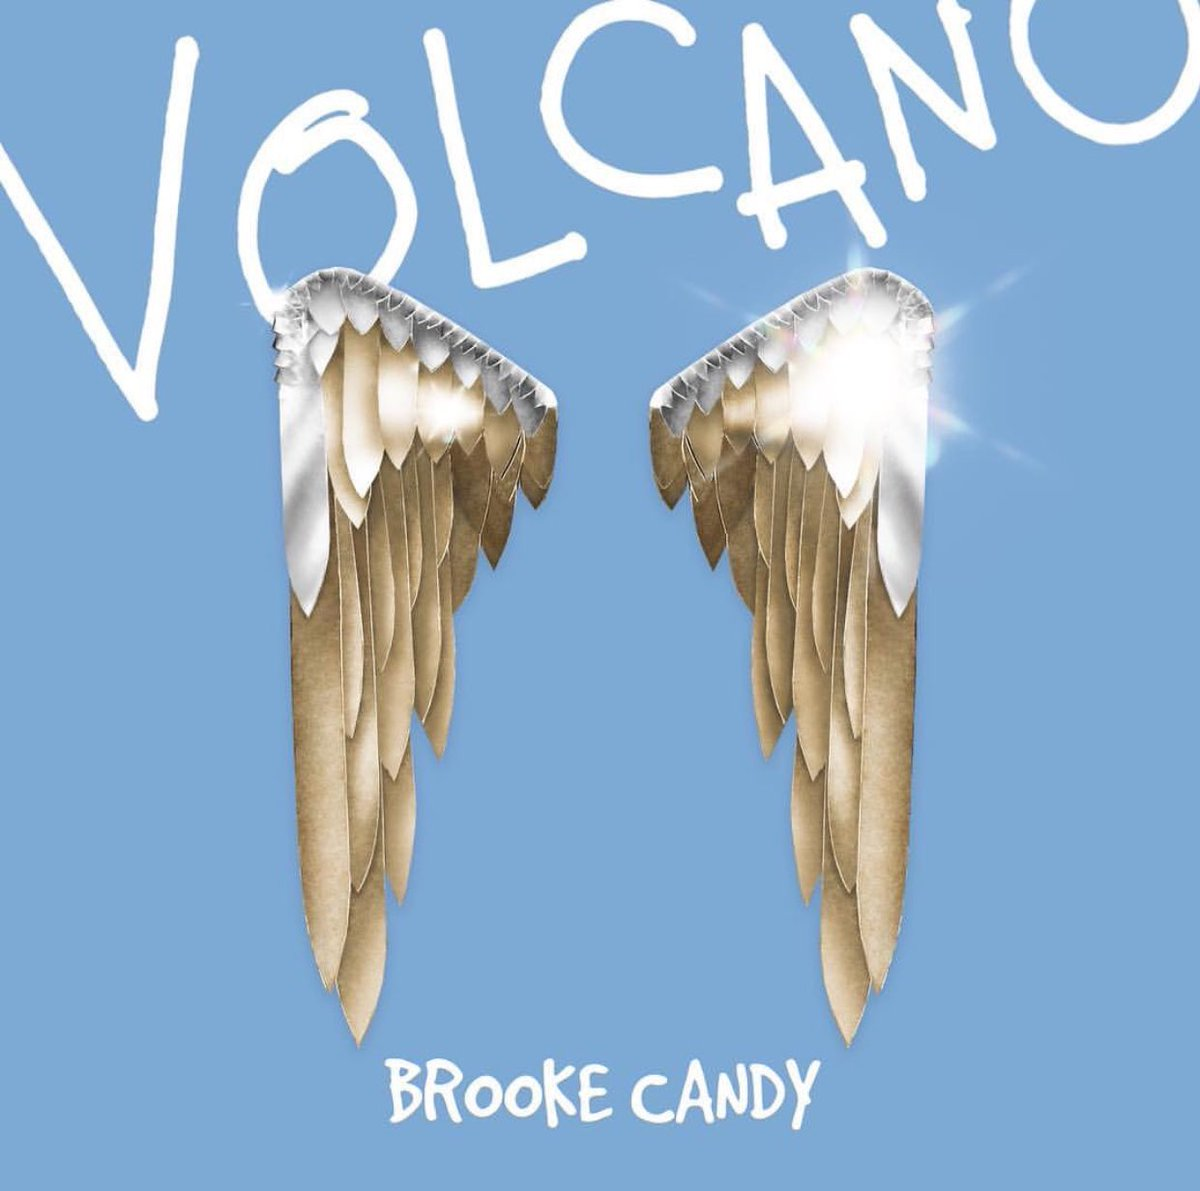 Brooke Candy Volcano